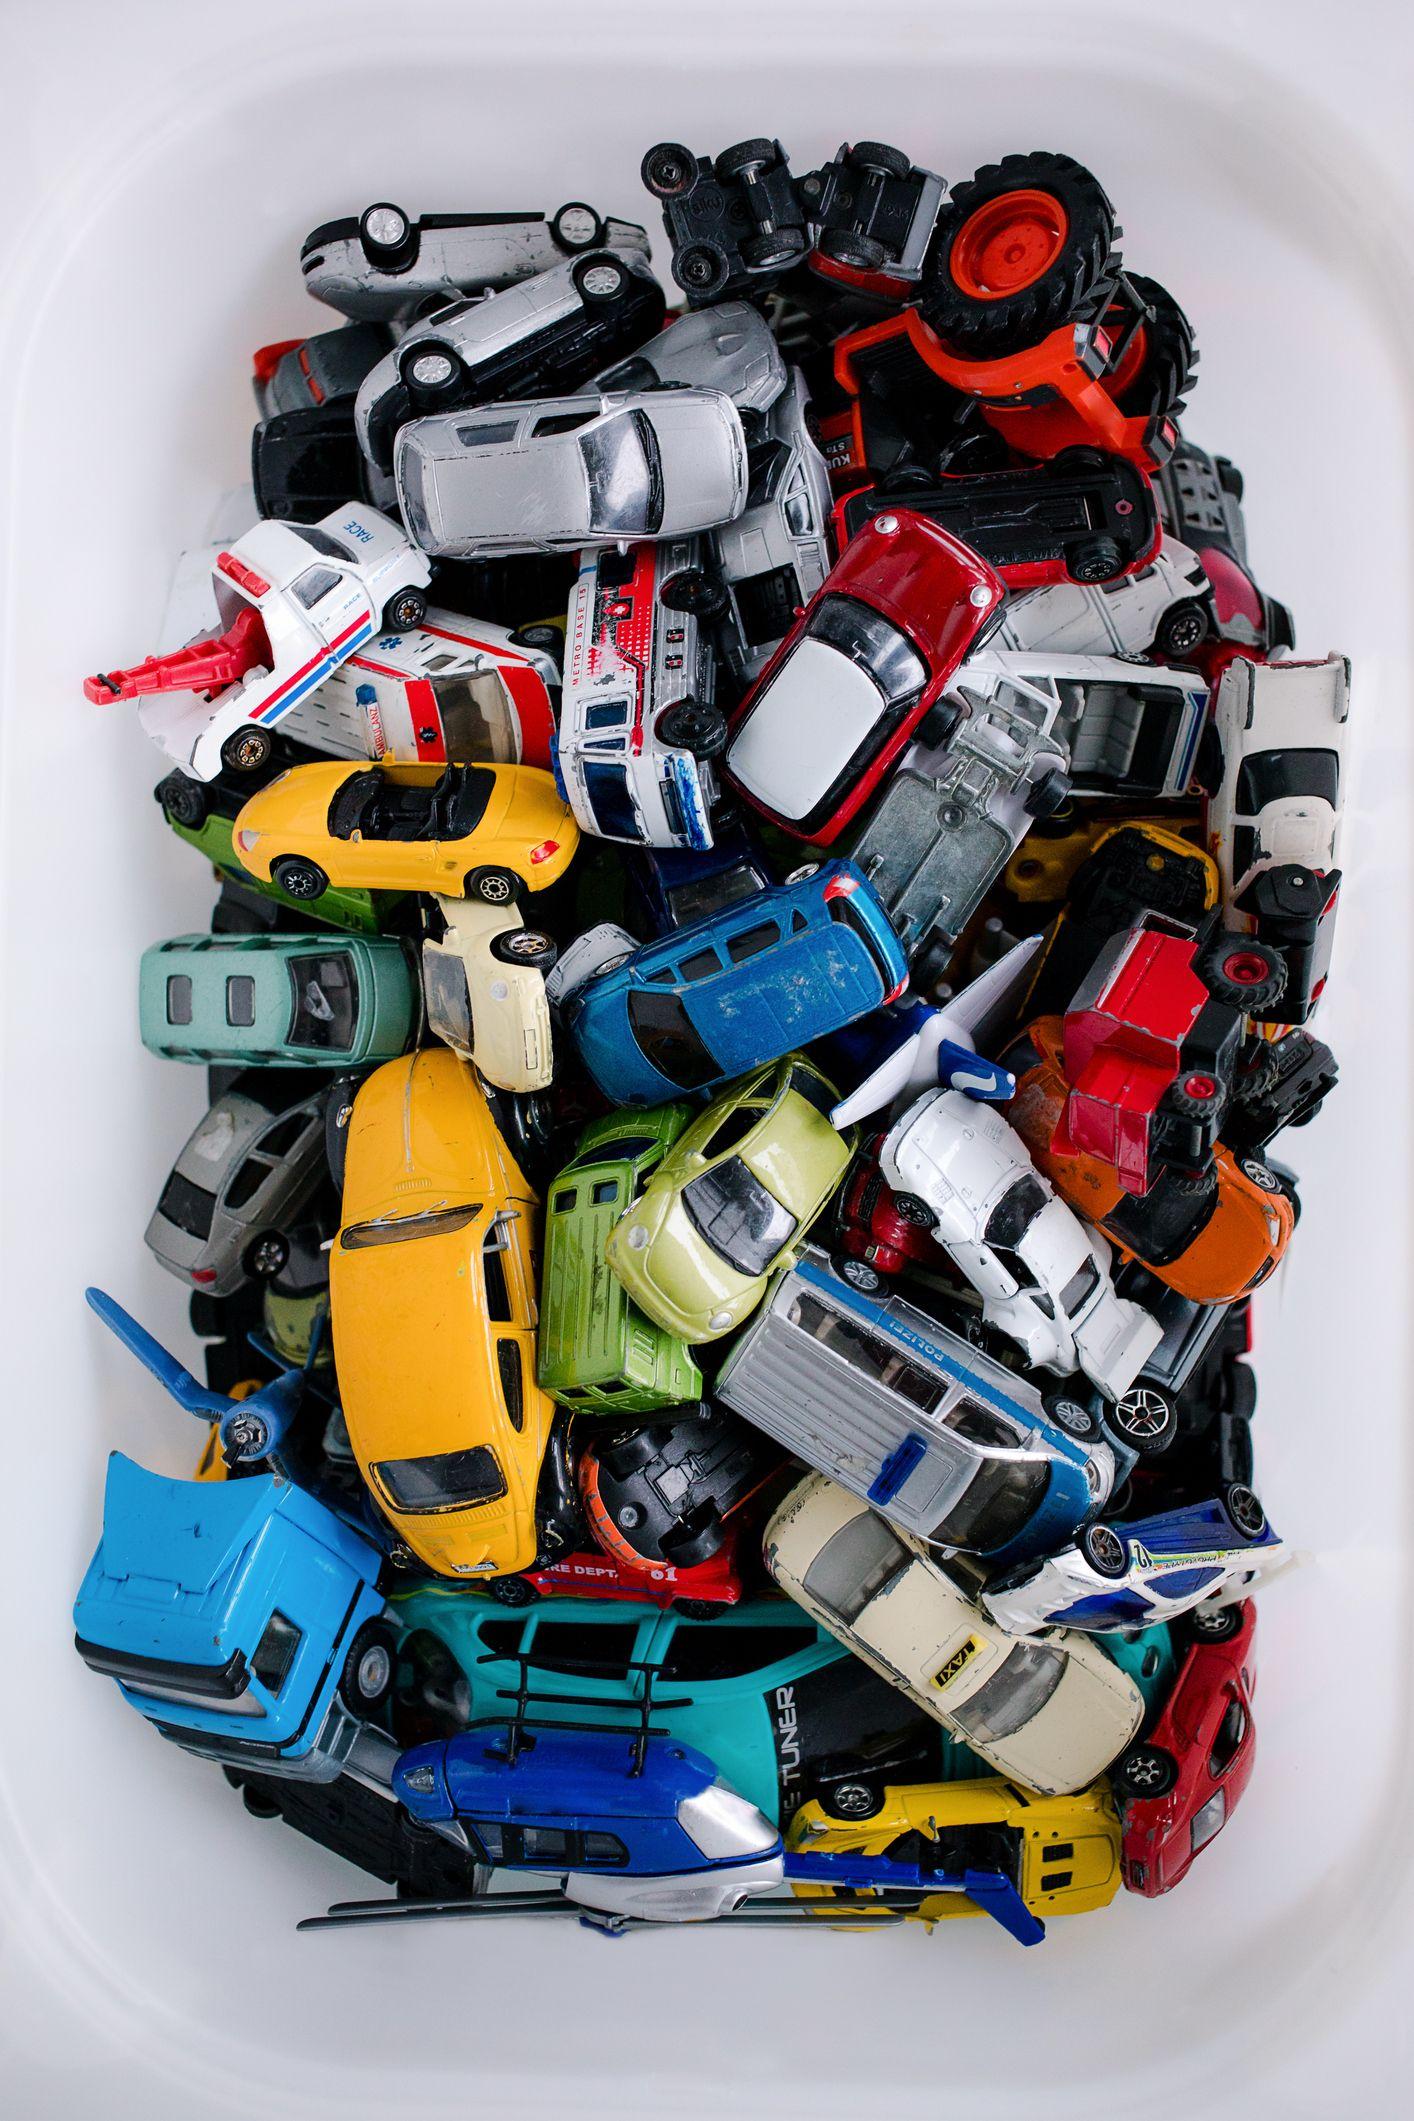 10 Best Toy Storage Bins and Ideas - Top Ways to Organize Kids' Toys